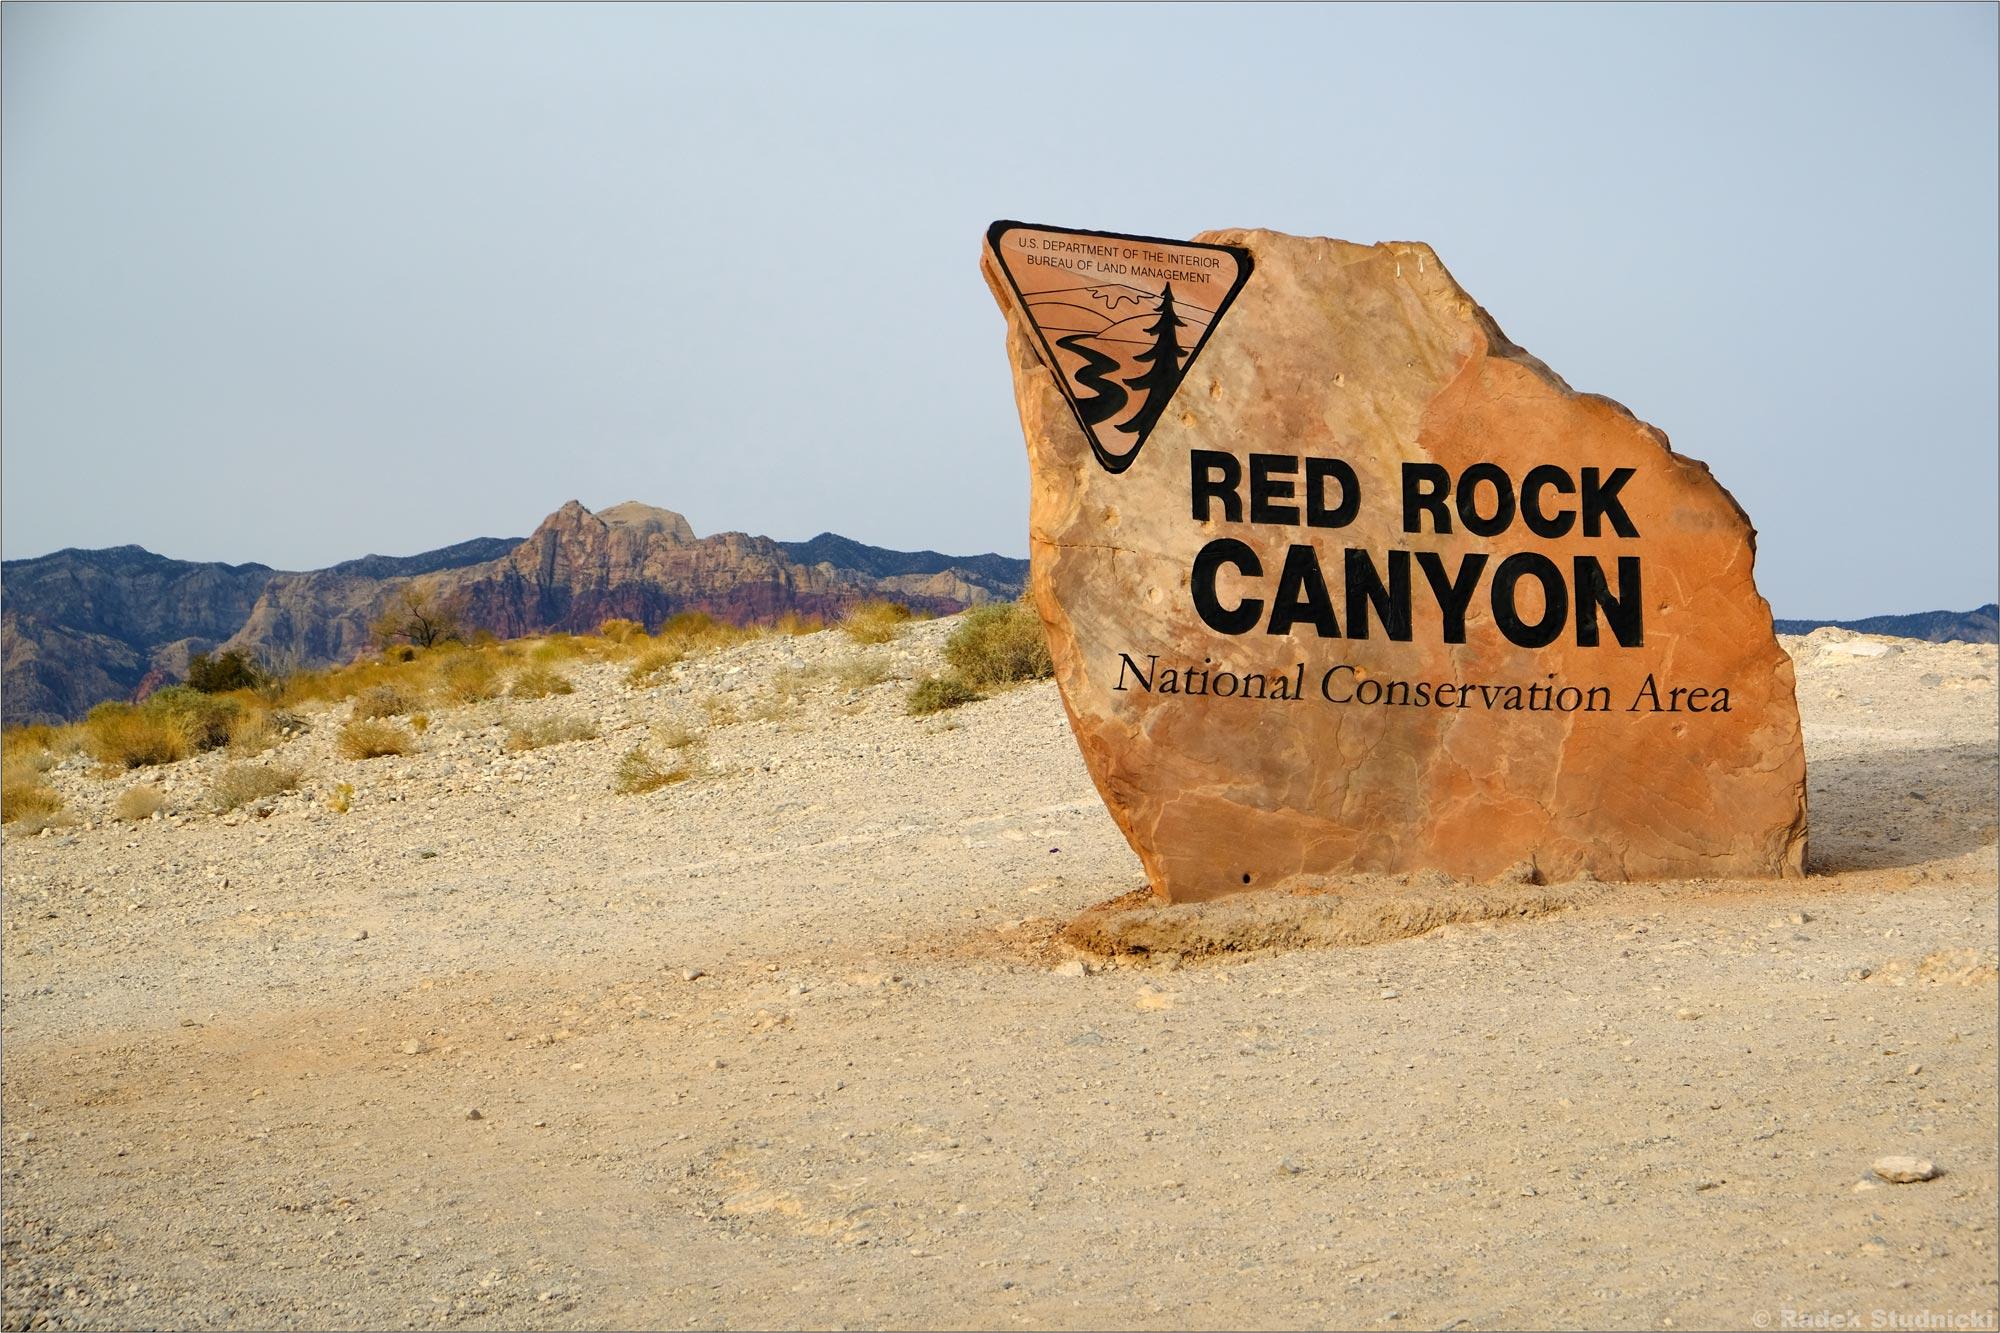 Wjazd do Red Rock Canyon